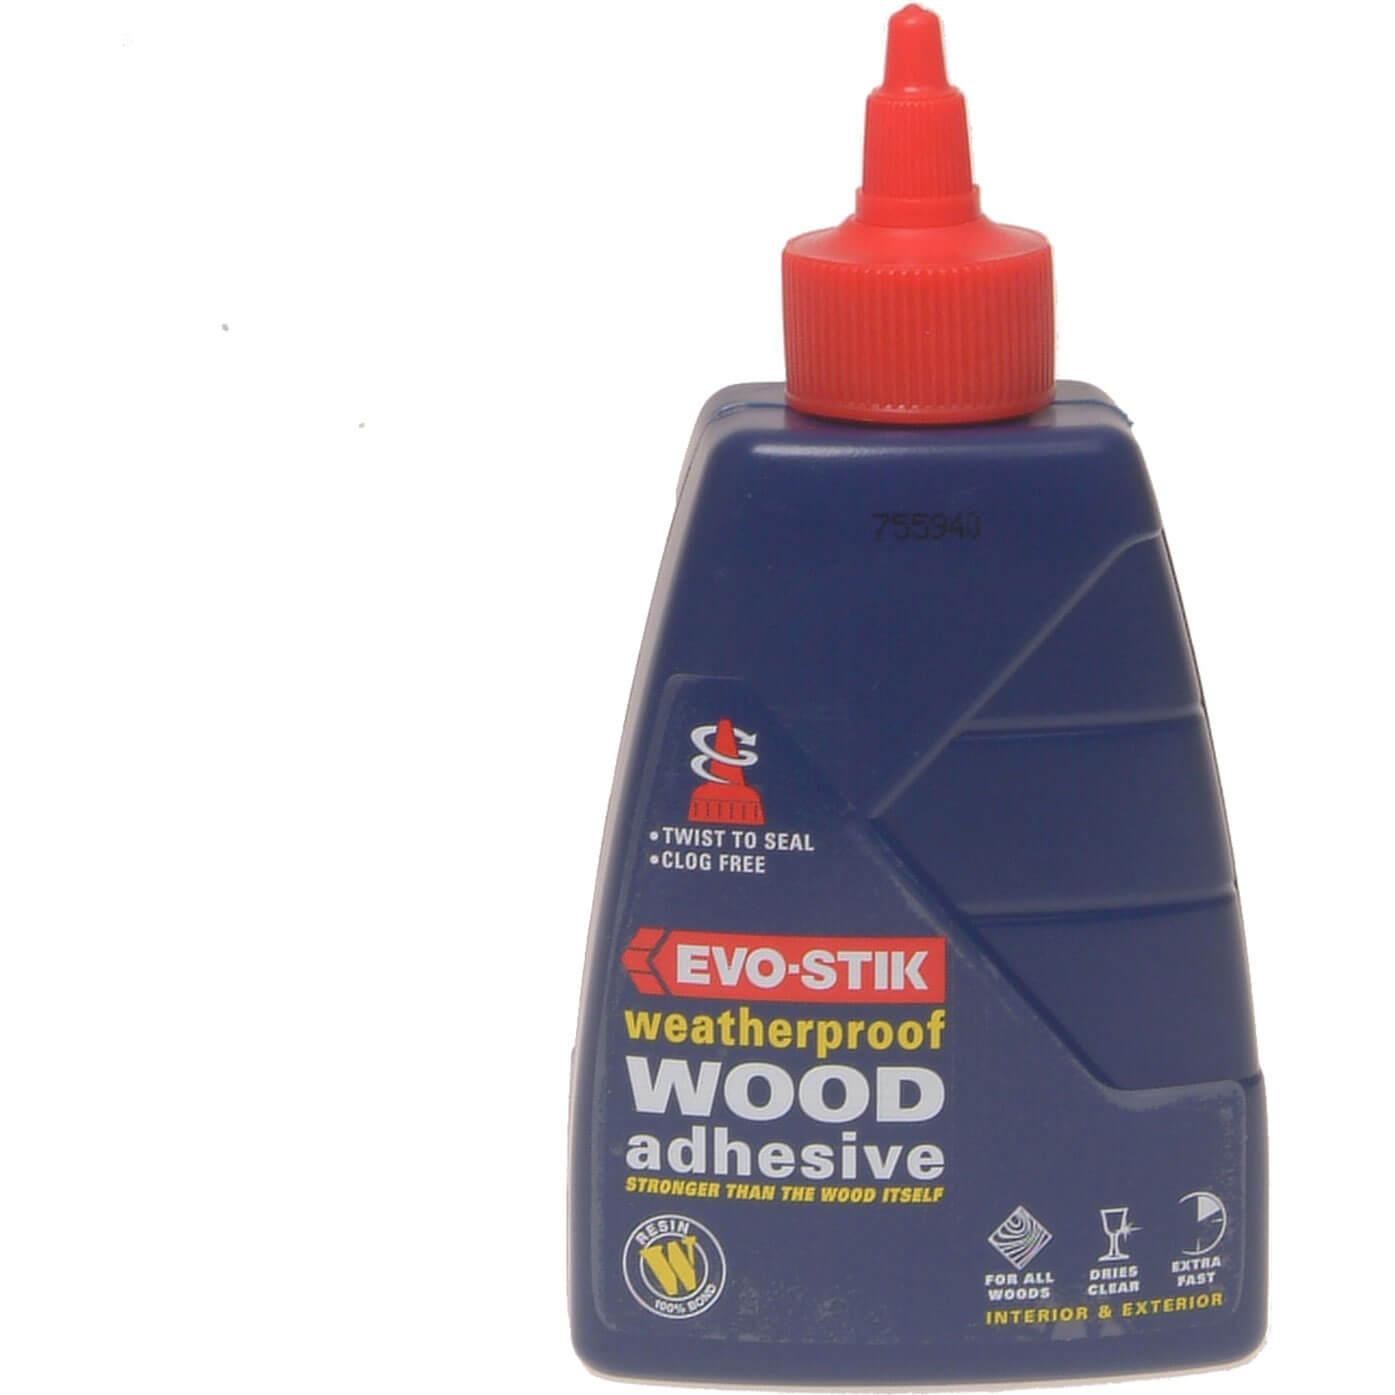 Evo-stik Weatherproof Wood Adhesive 250ml